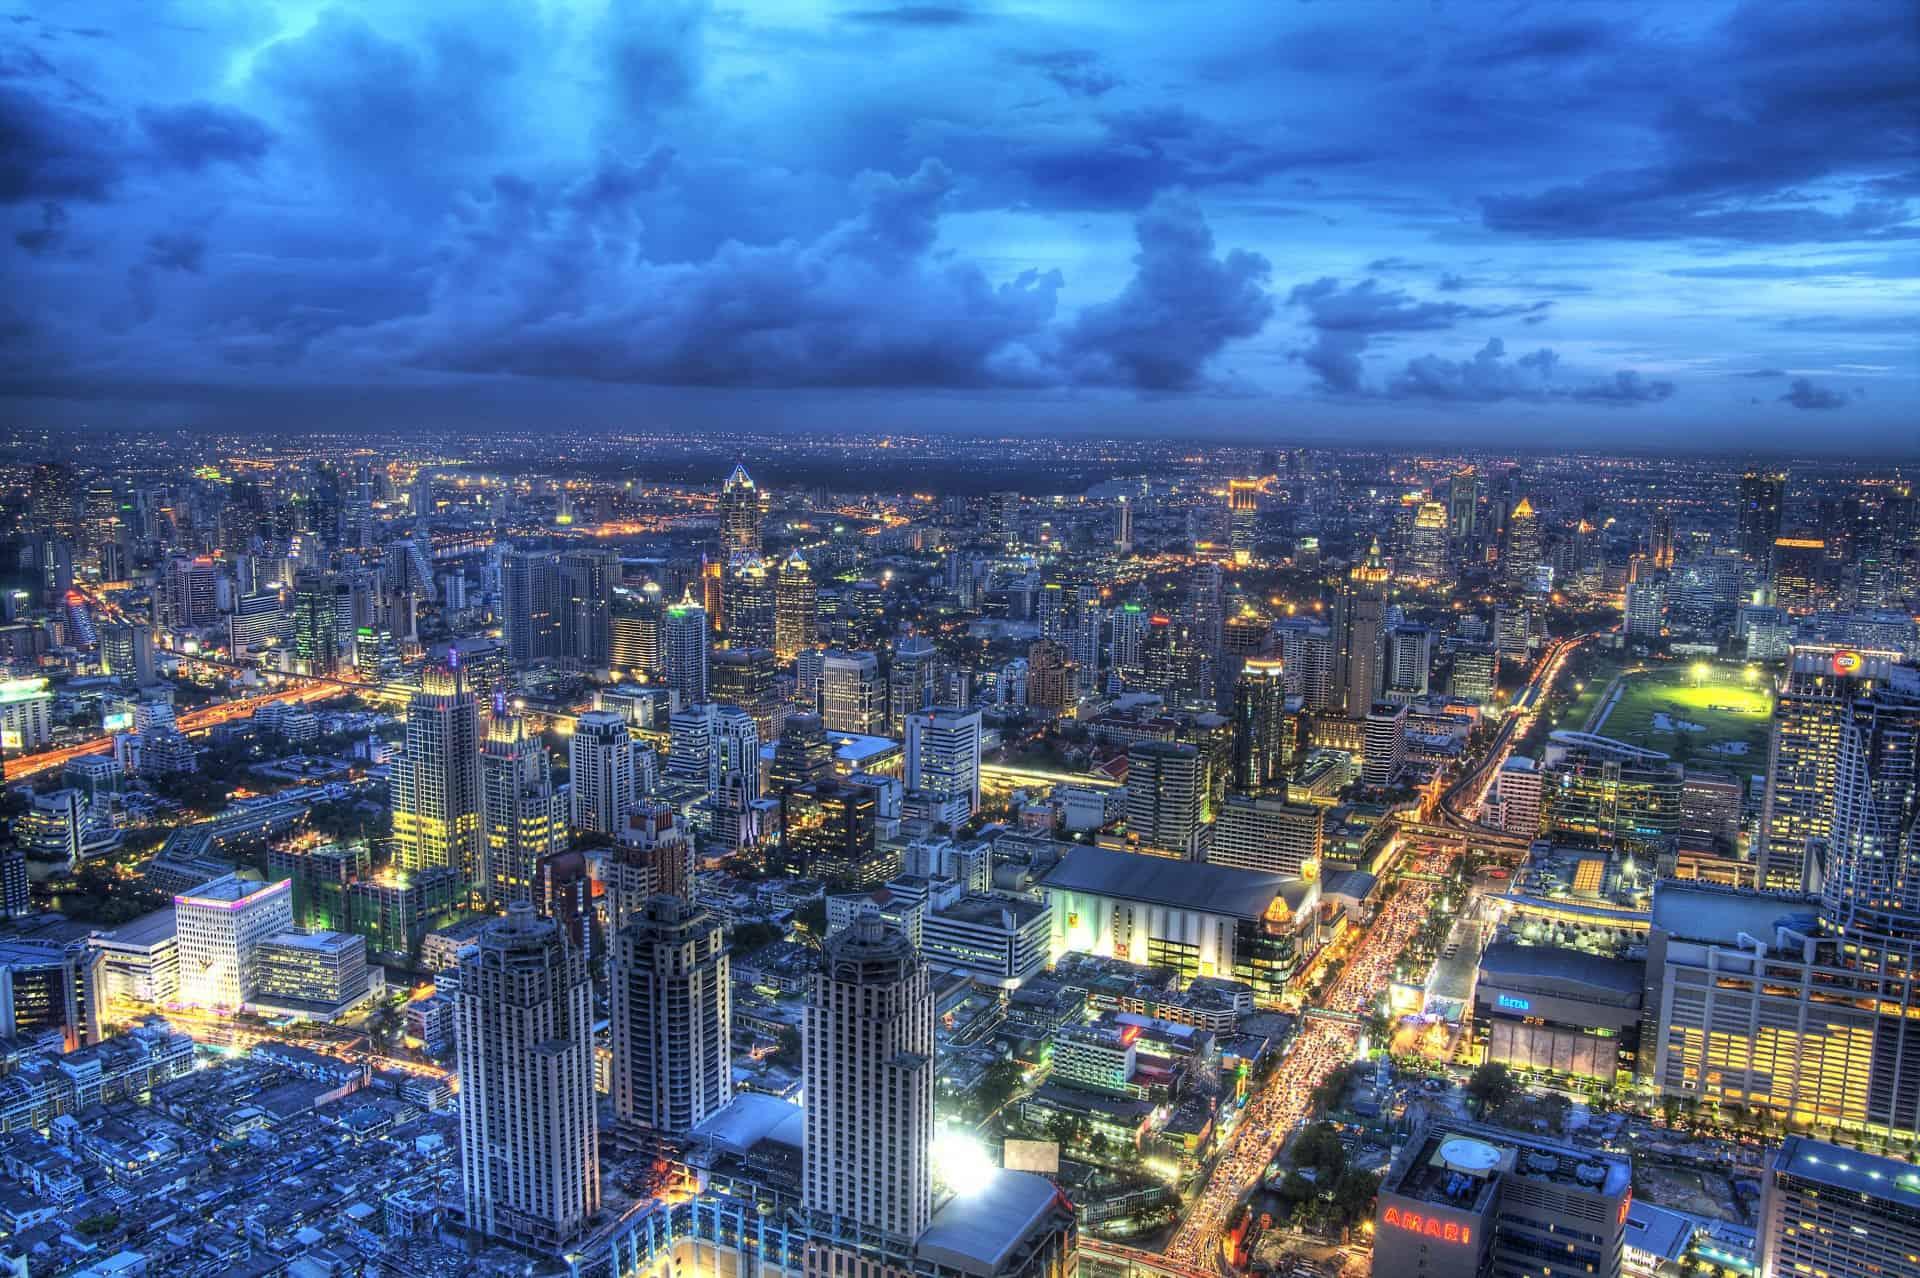 Panoramic Bangkok view from Baiyoke Sky Hotel Observation Deck